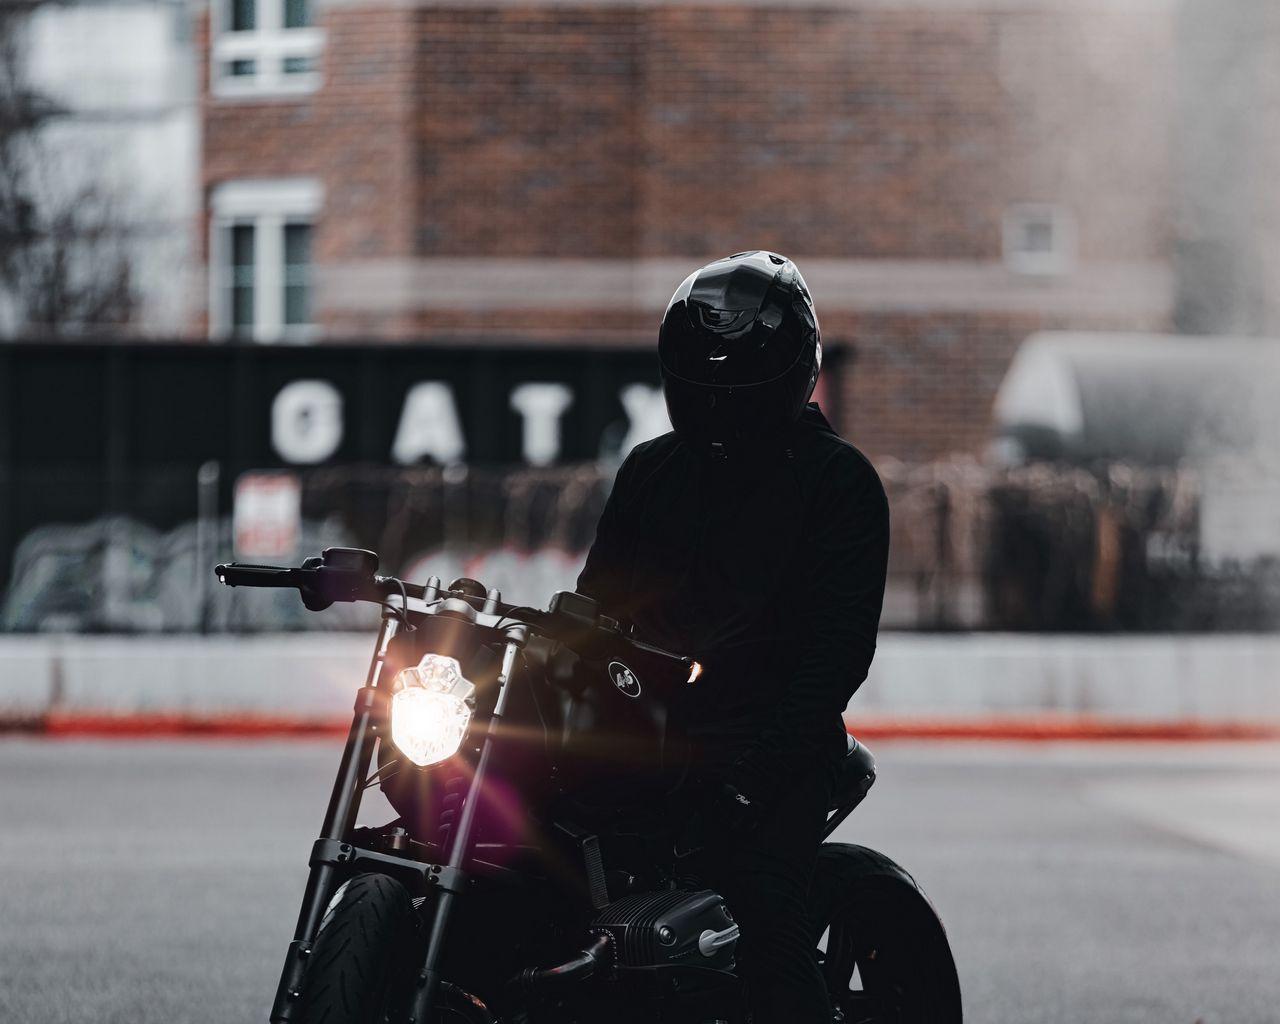 1280x1024 Обои мотоцикл, байк, мотоциклист, черный, свет, дорога